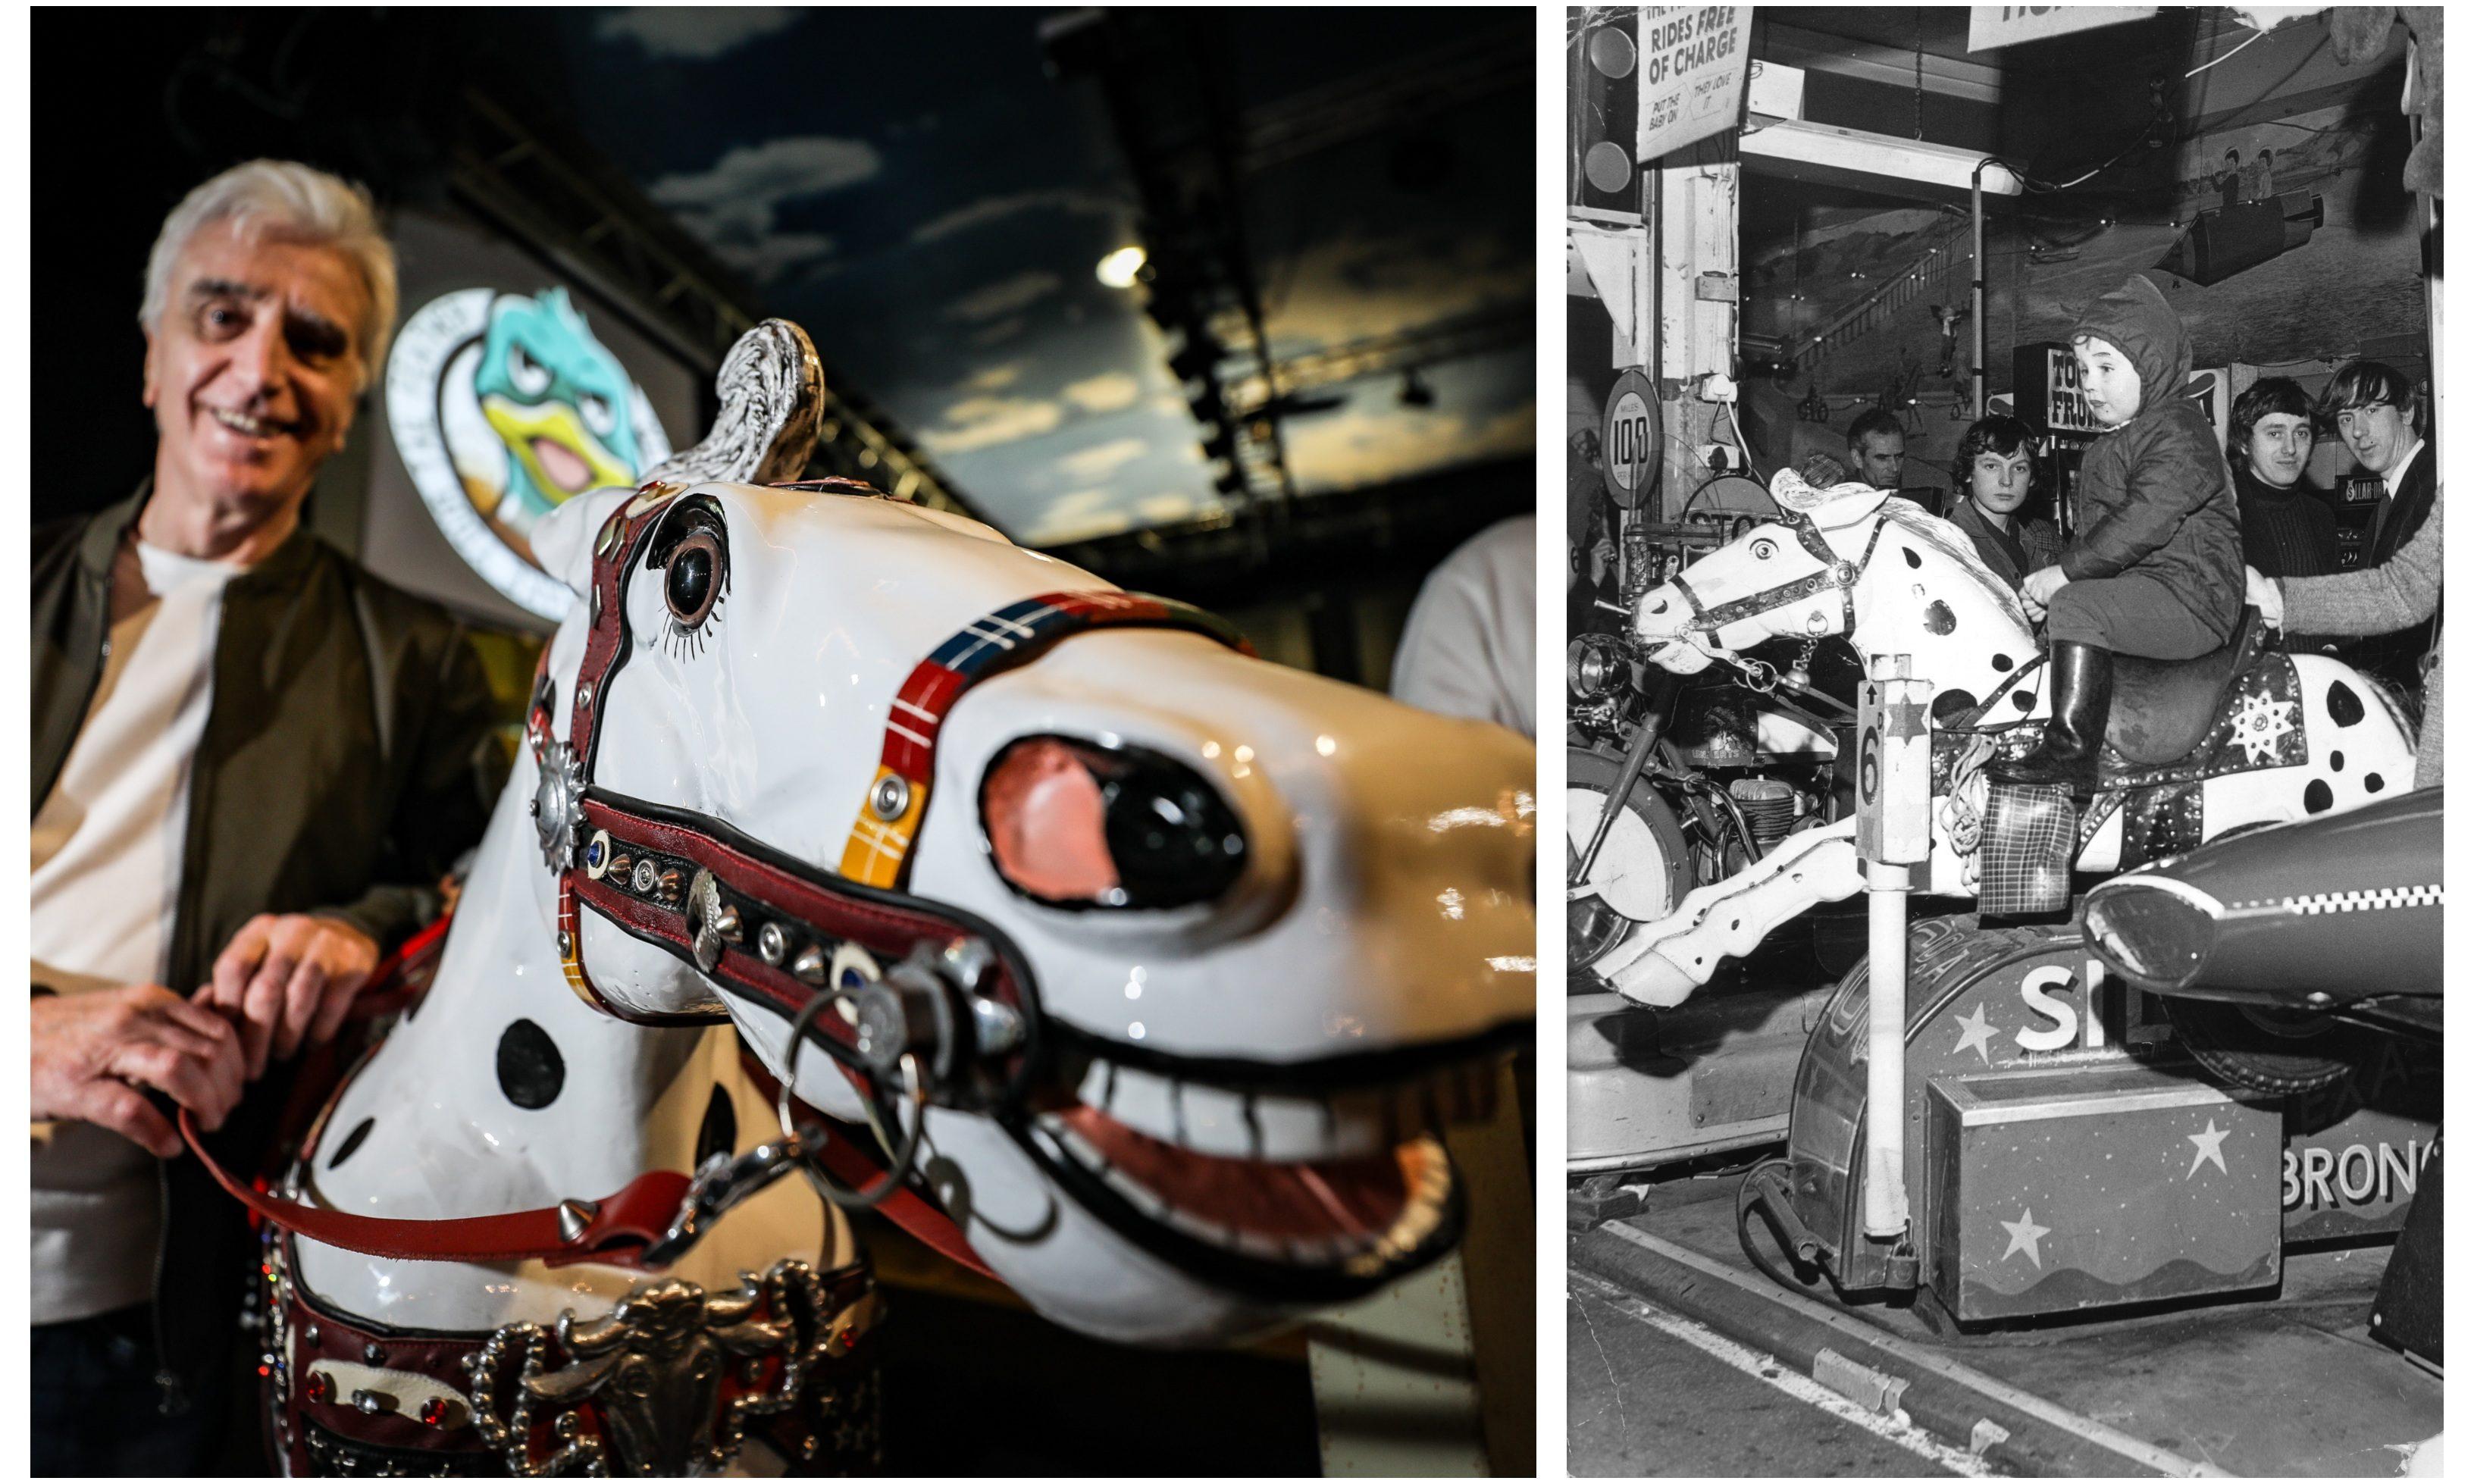 Tony Cochrane with Champion. Right: Champion the Wonder Horse at the City Arcades.